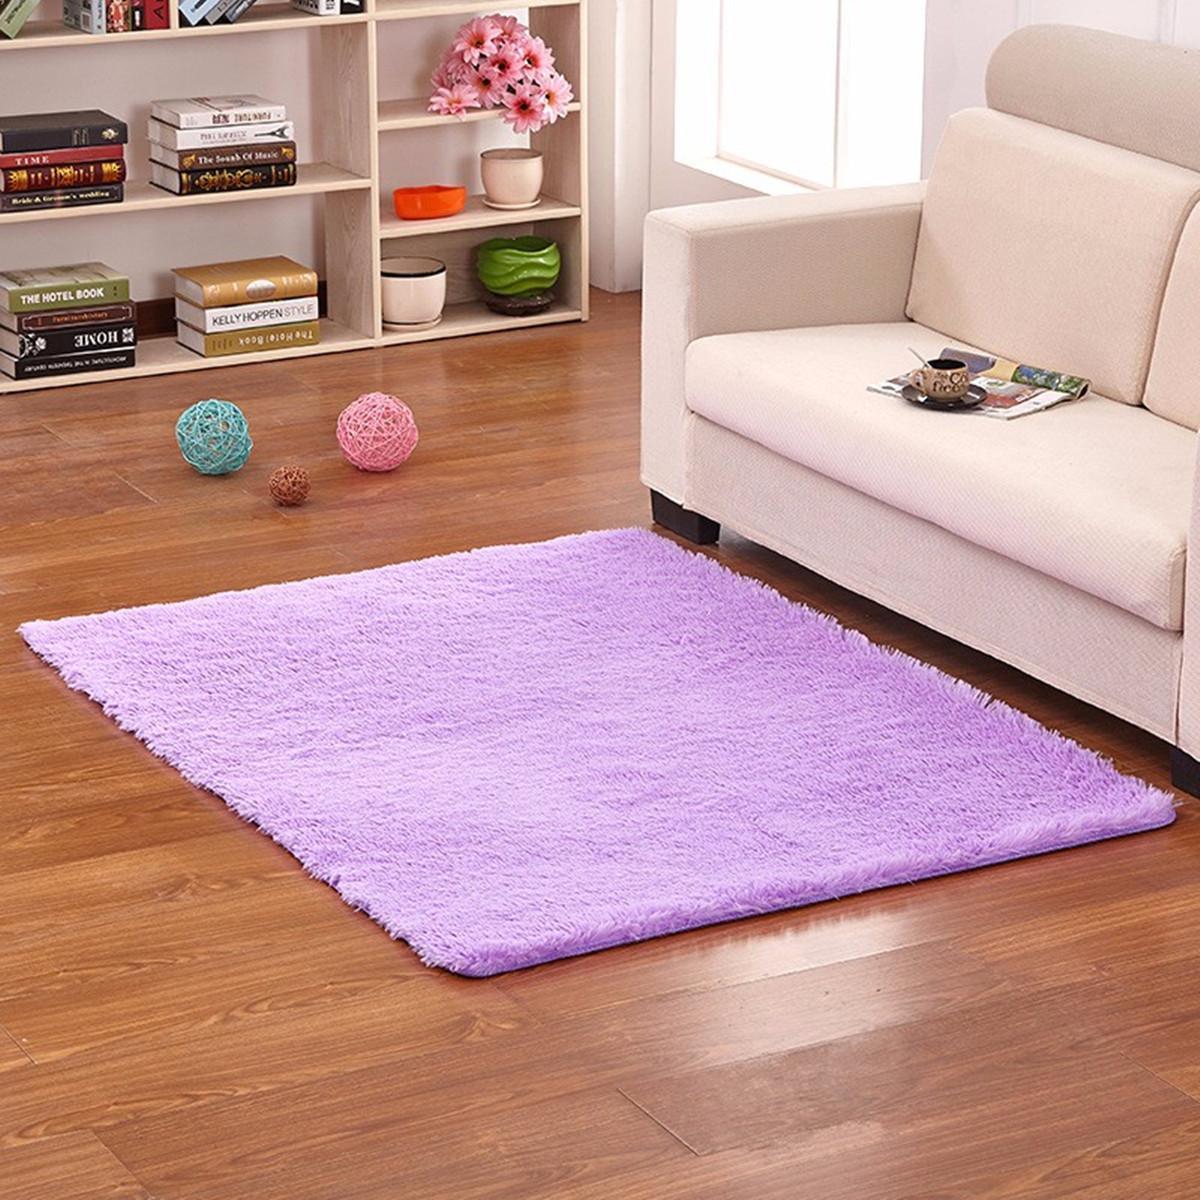 Honana WX-329 50x80cm Bedroom Living Room Soft Rug Shaggy Anti Slip Carpet Absorbent Mat